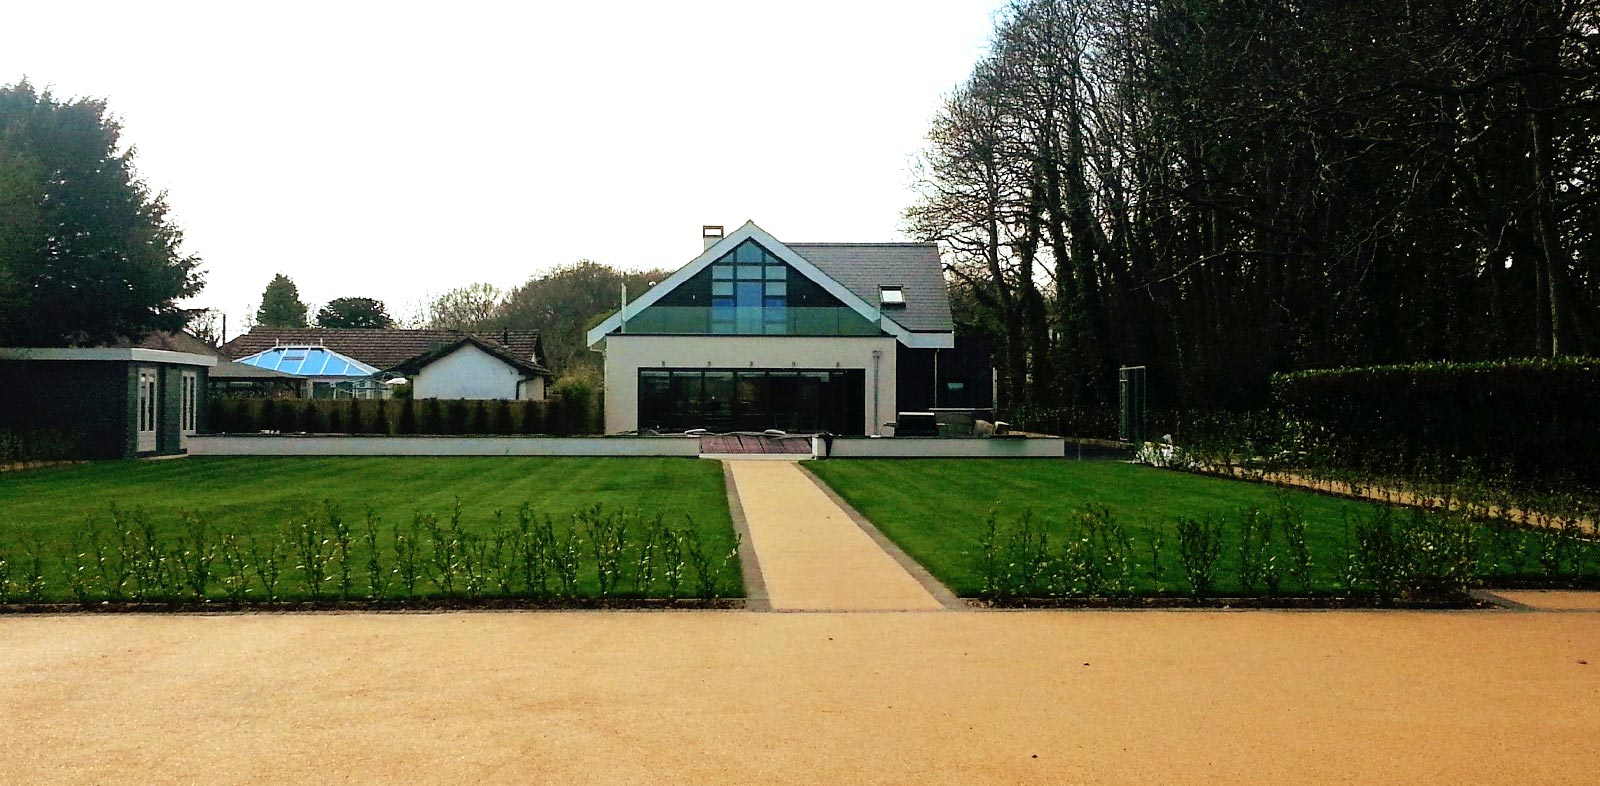 West-Parley-new-build-dg-morgan